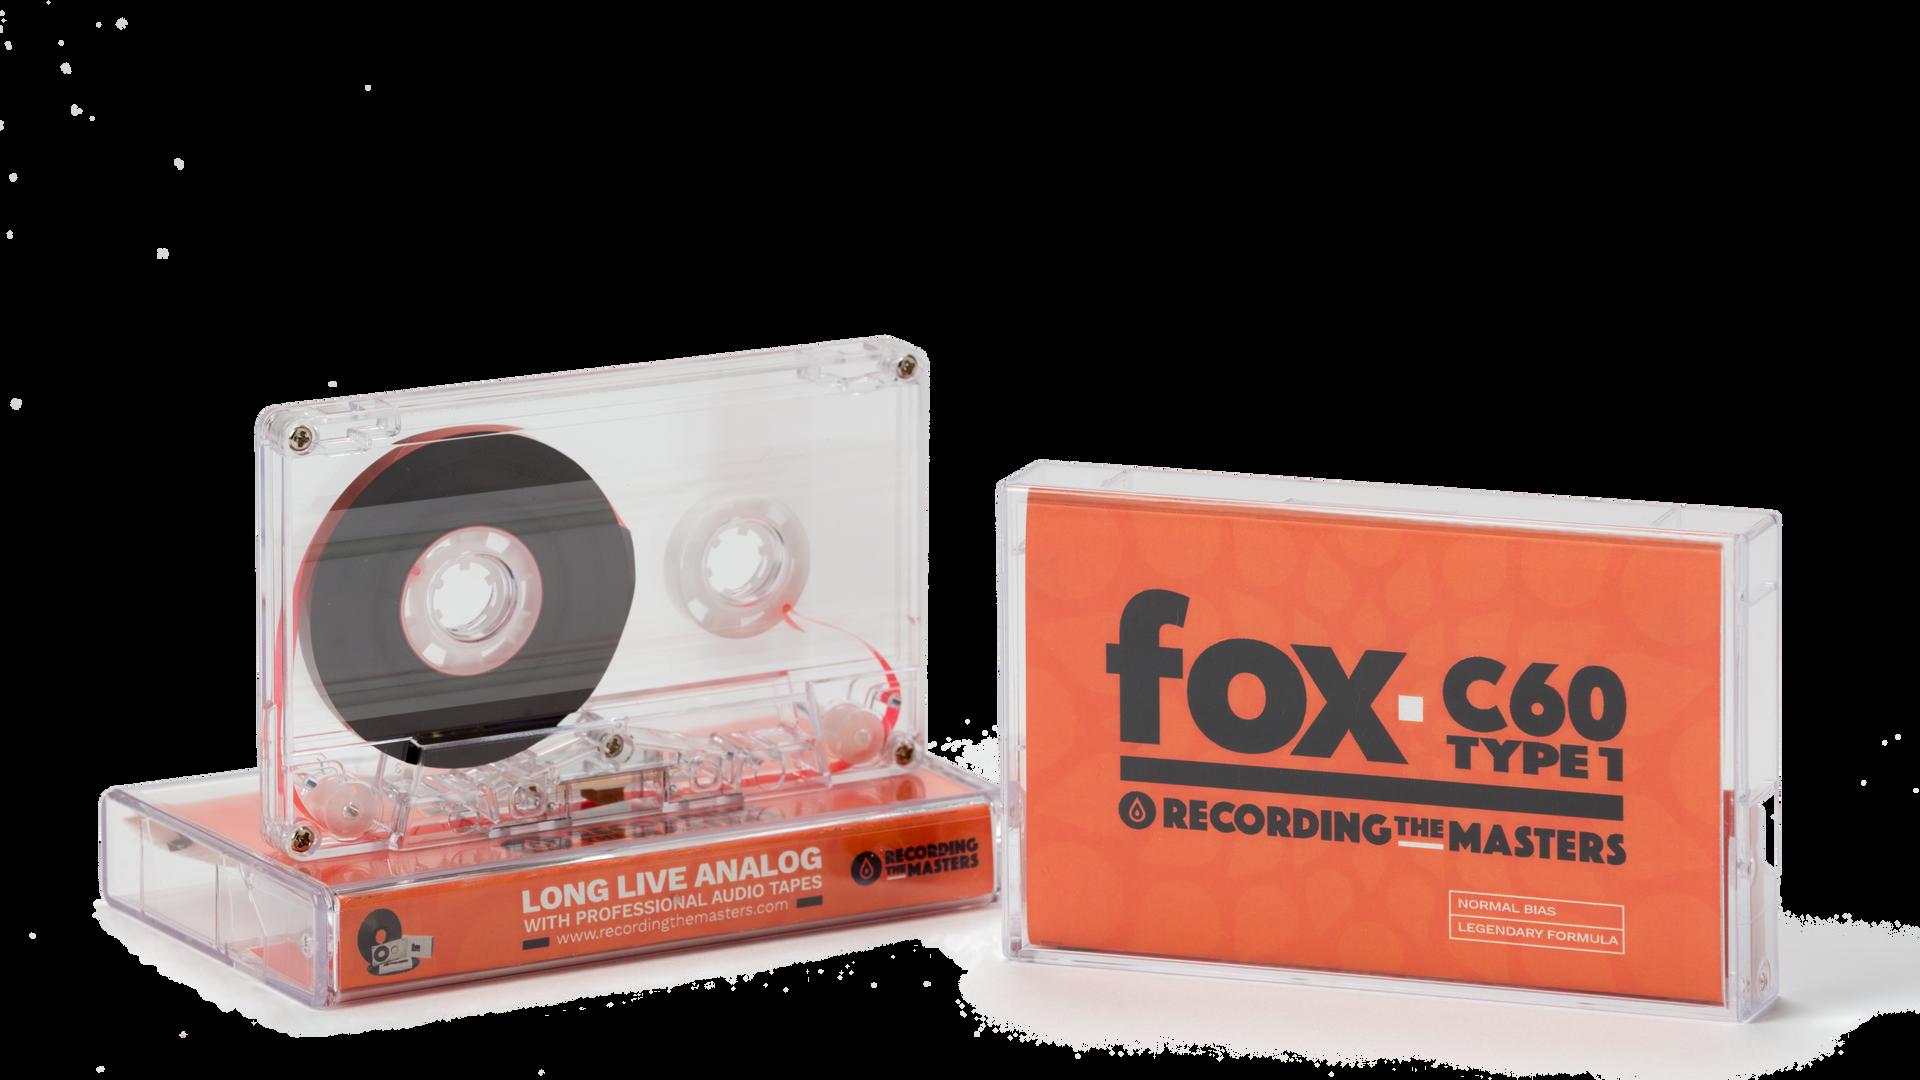 FOX C60 png v2.png